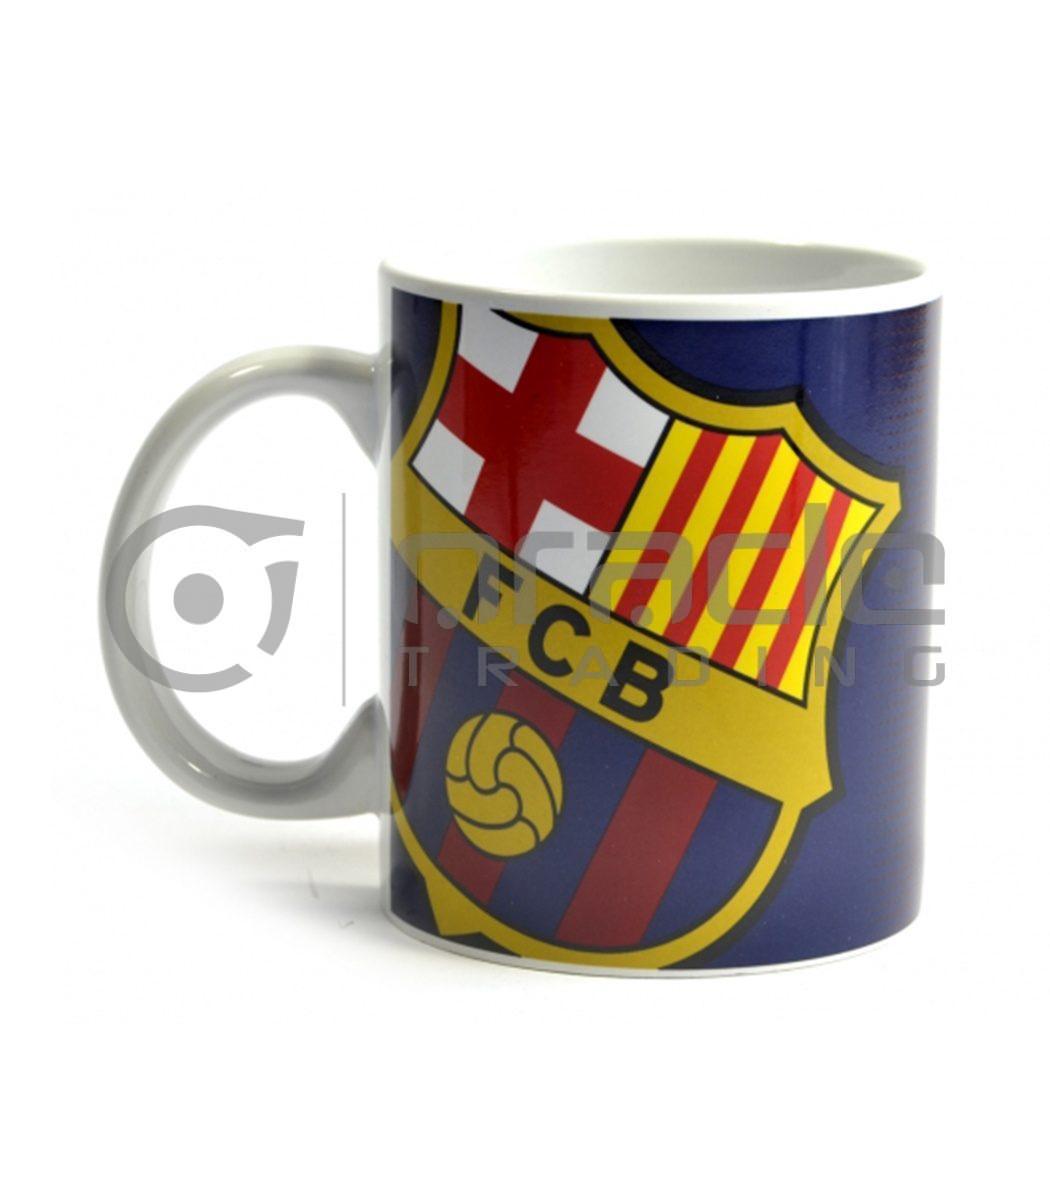 Barcelona Crest Mug (Boxed)